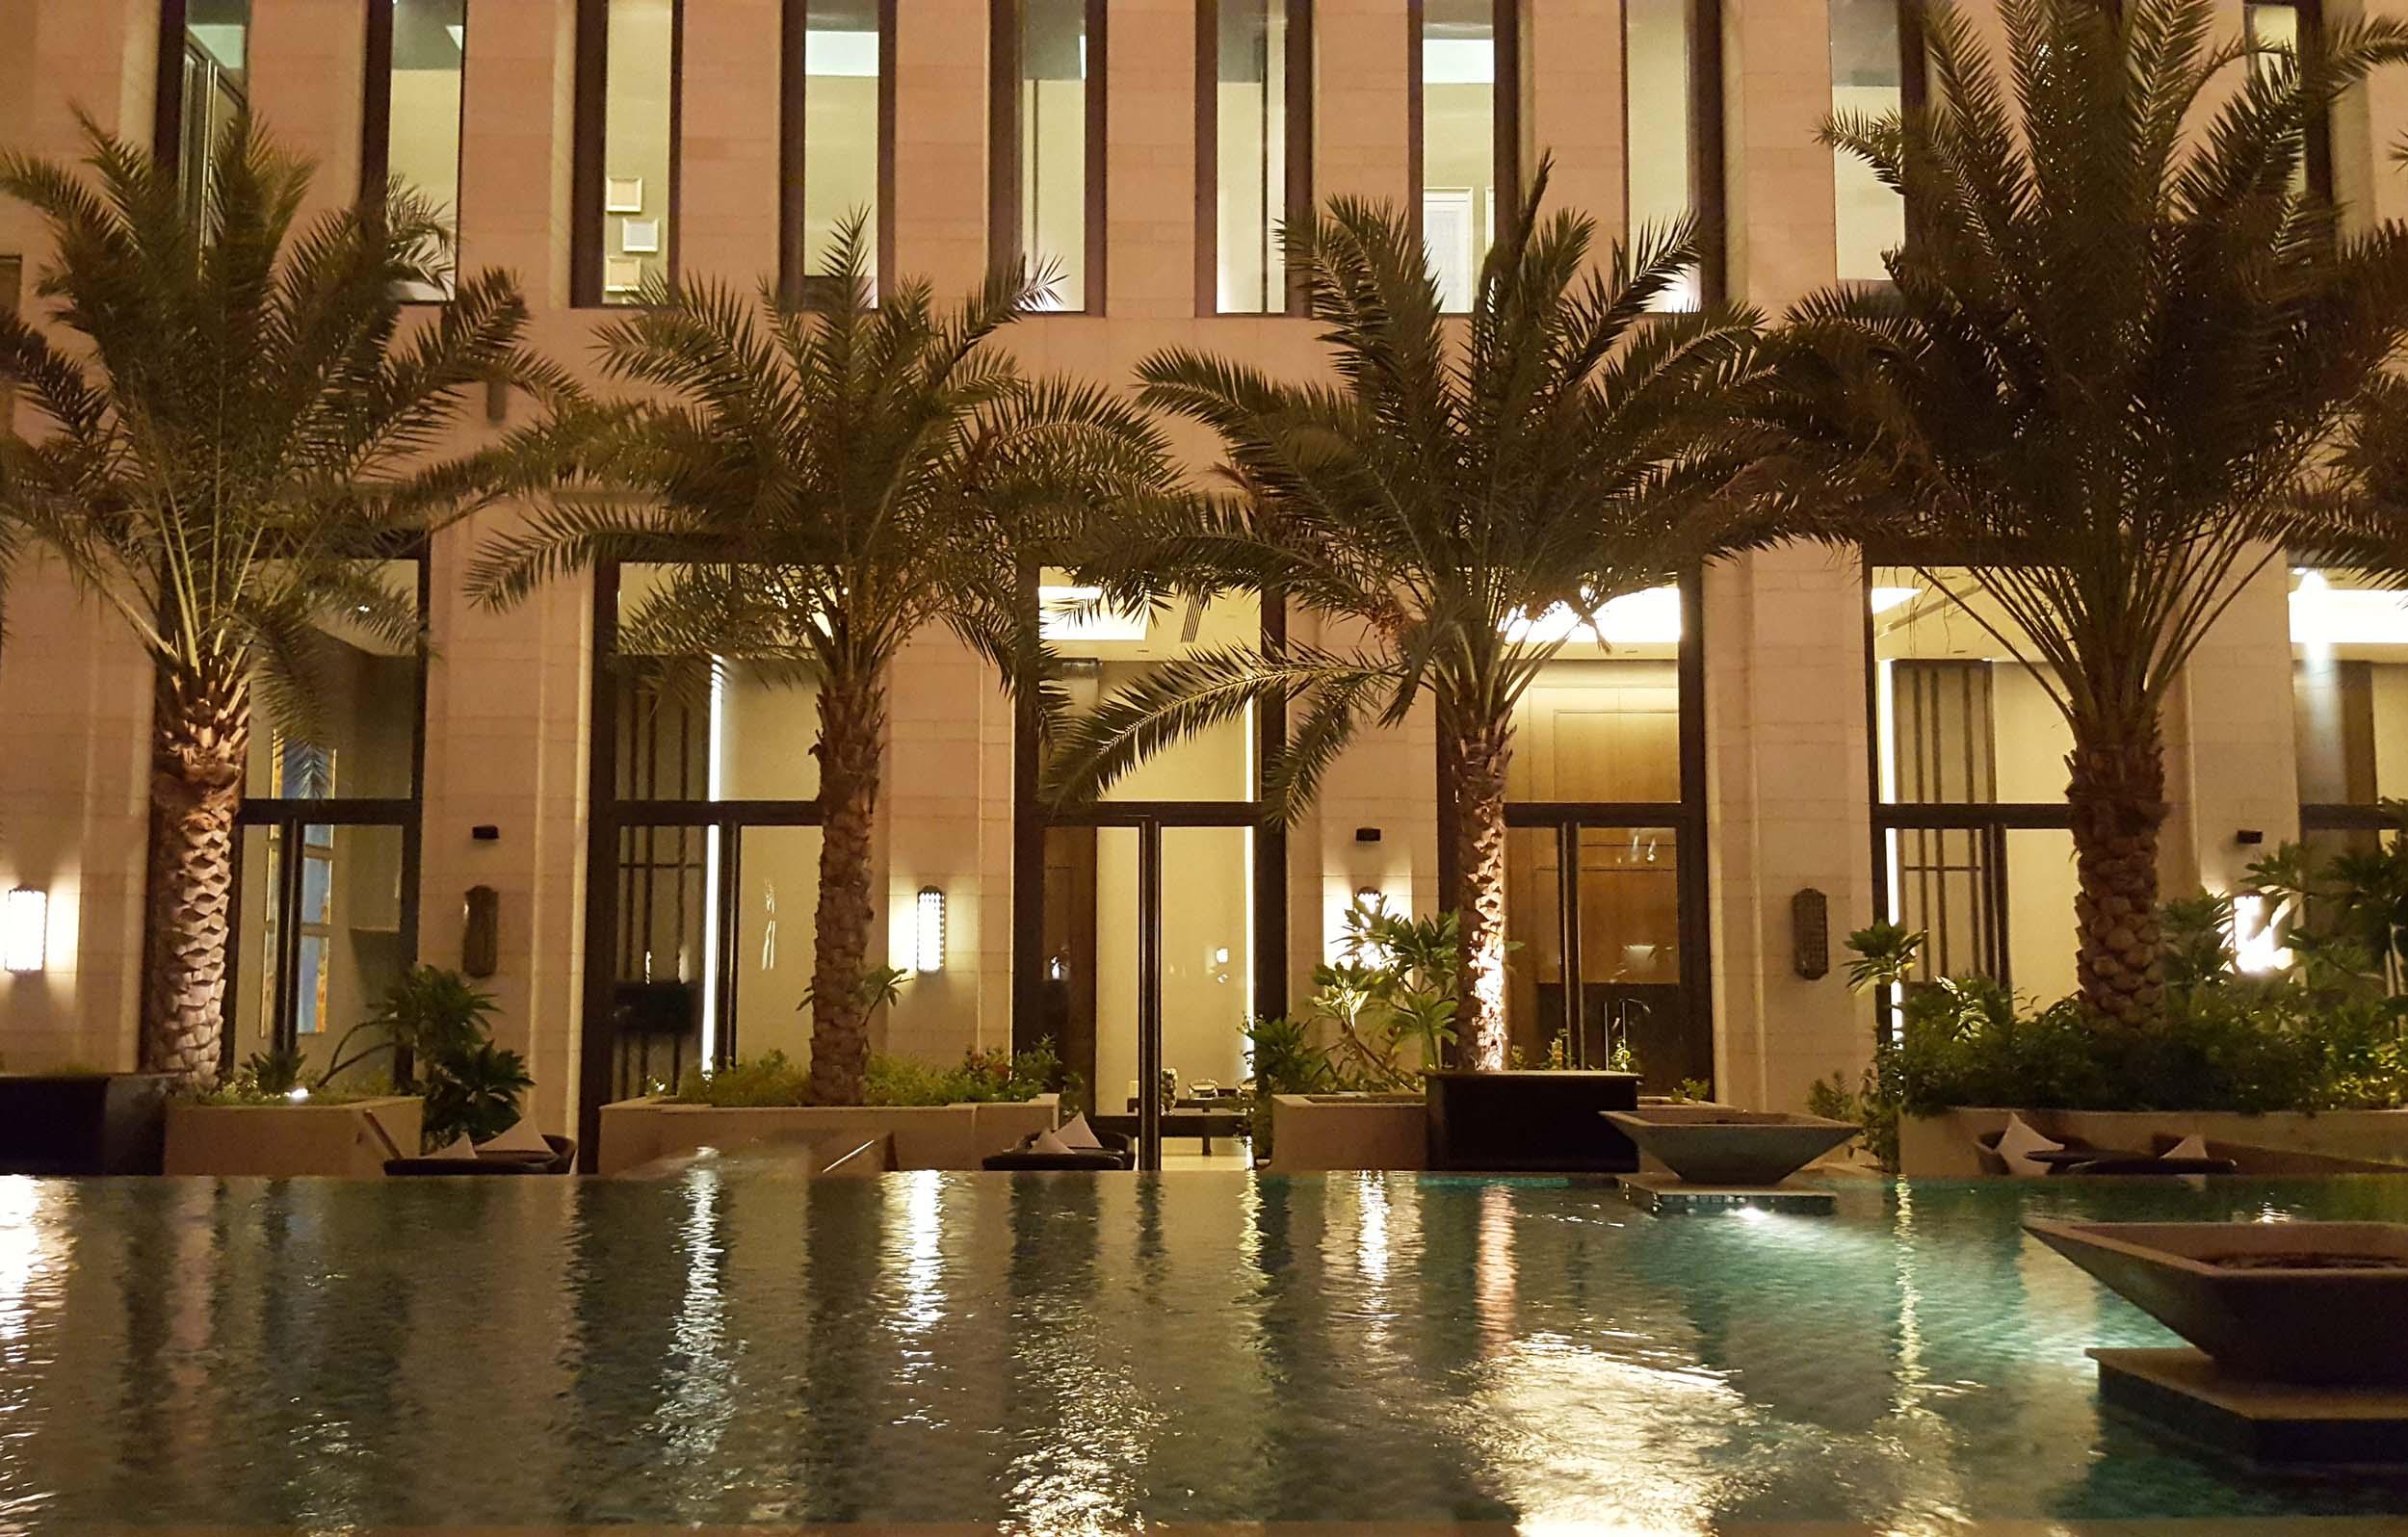 Hormuz Grand courtyard pool and palms.jpg